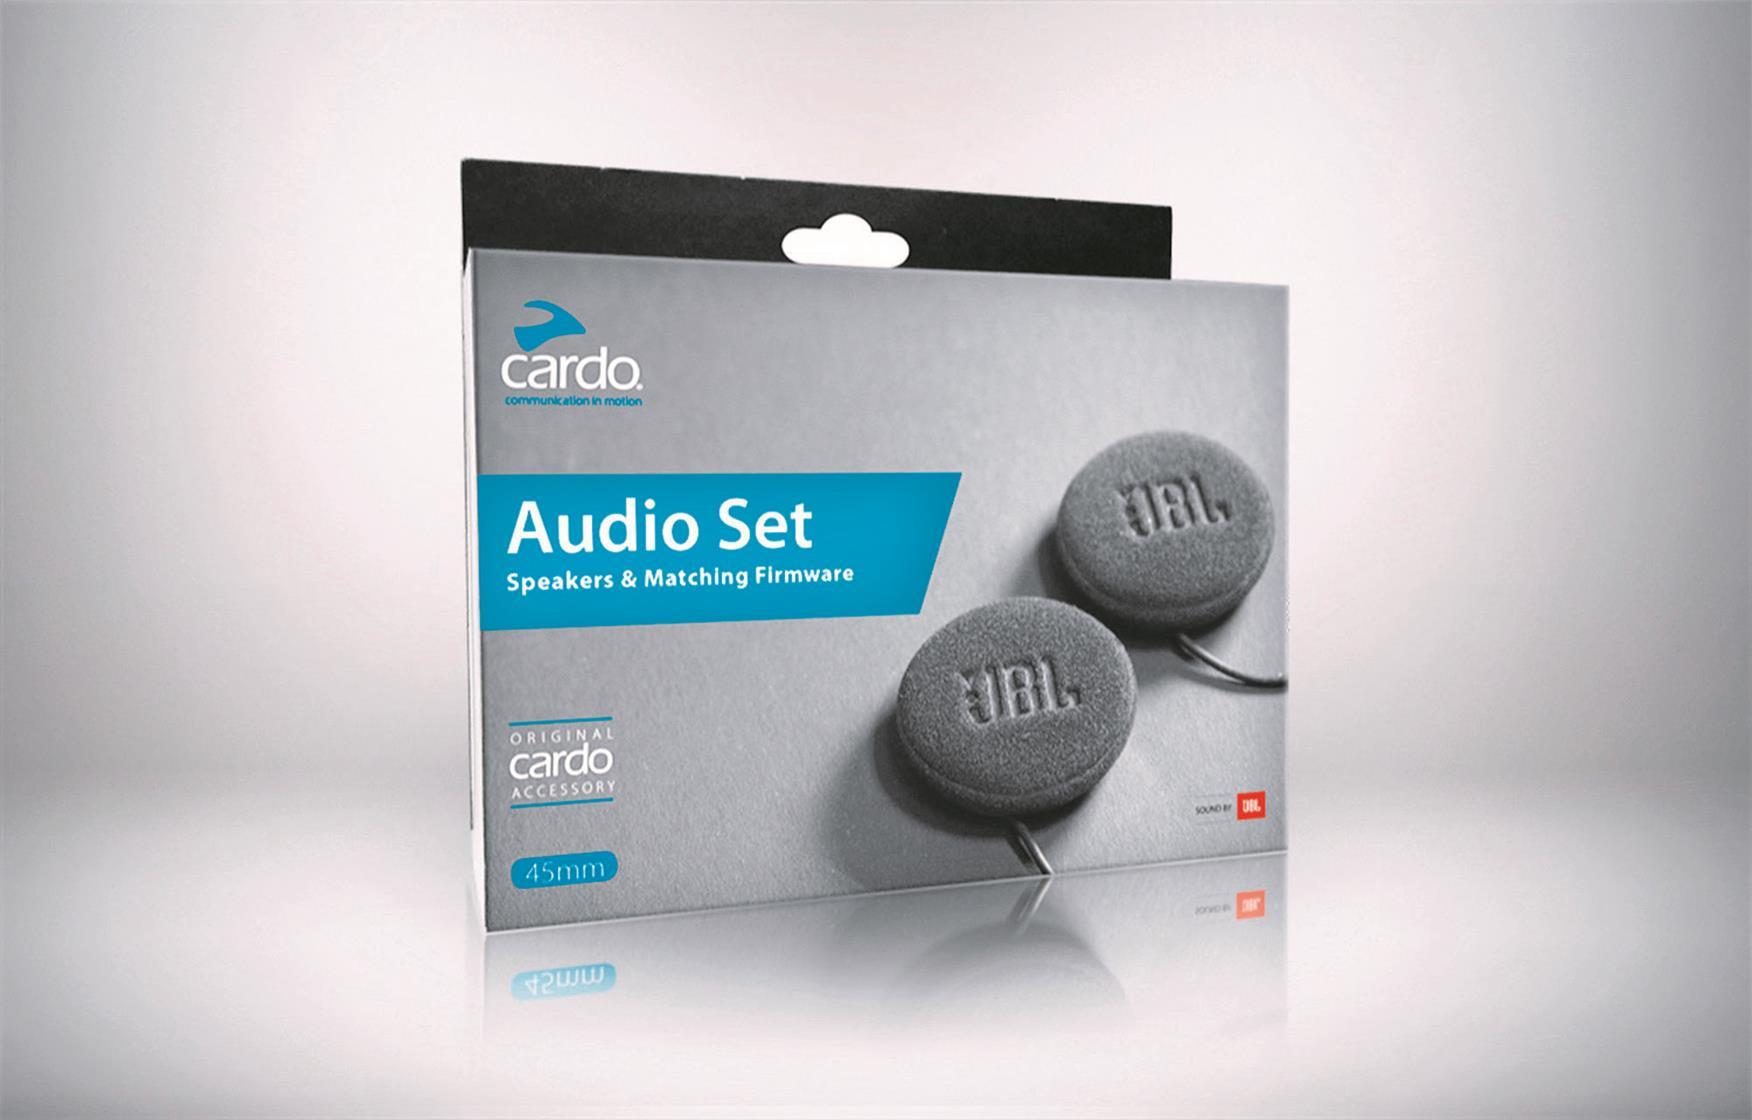 Cardo add retrofit JBL speakers for Bluetooth headsets